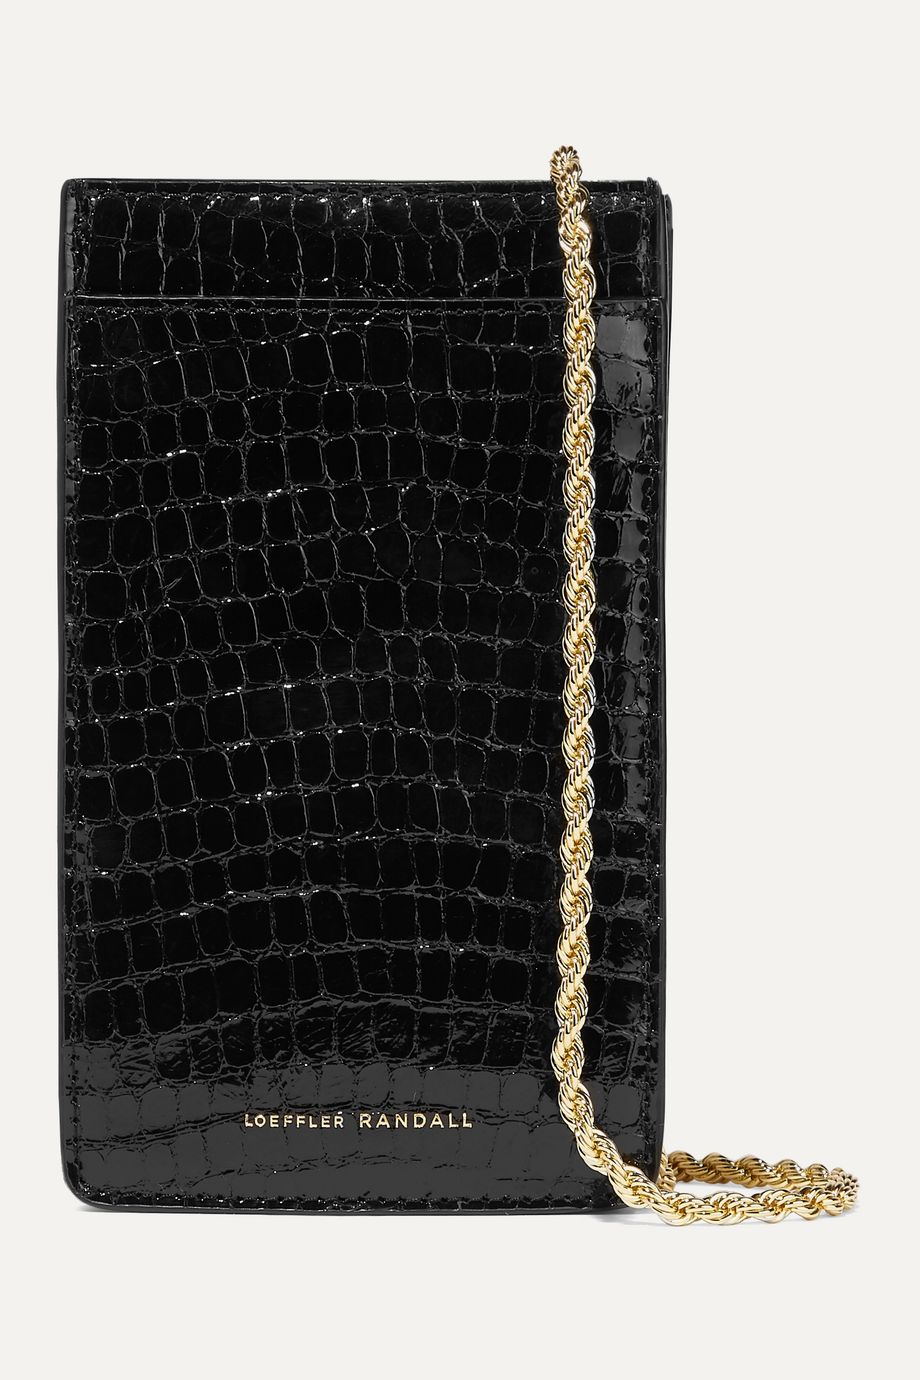 Loeffler Randall Augusta croc-effect patent-leather shoulder bag